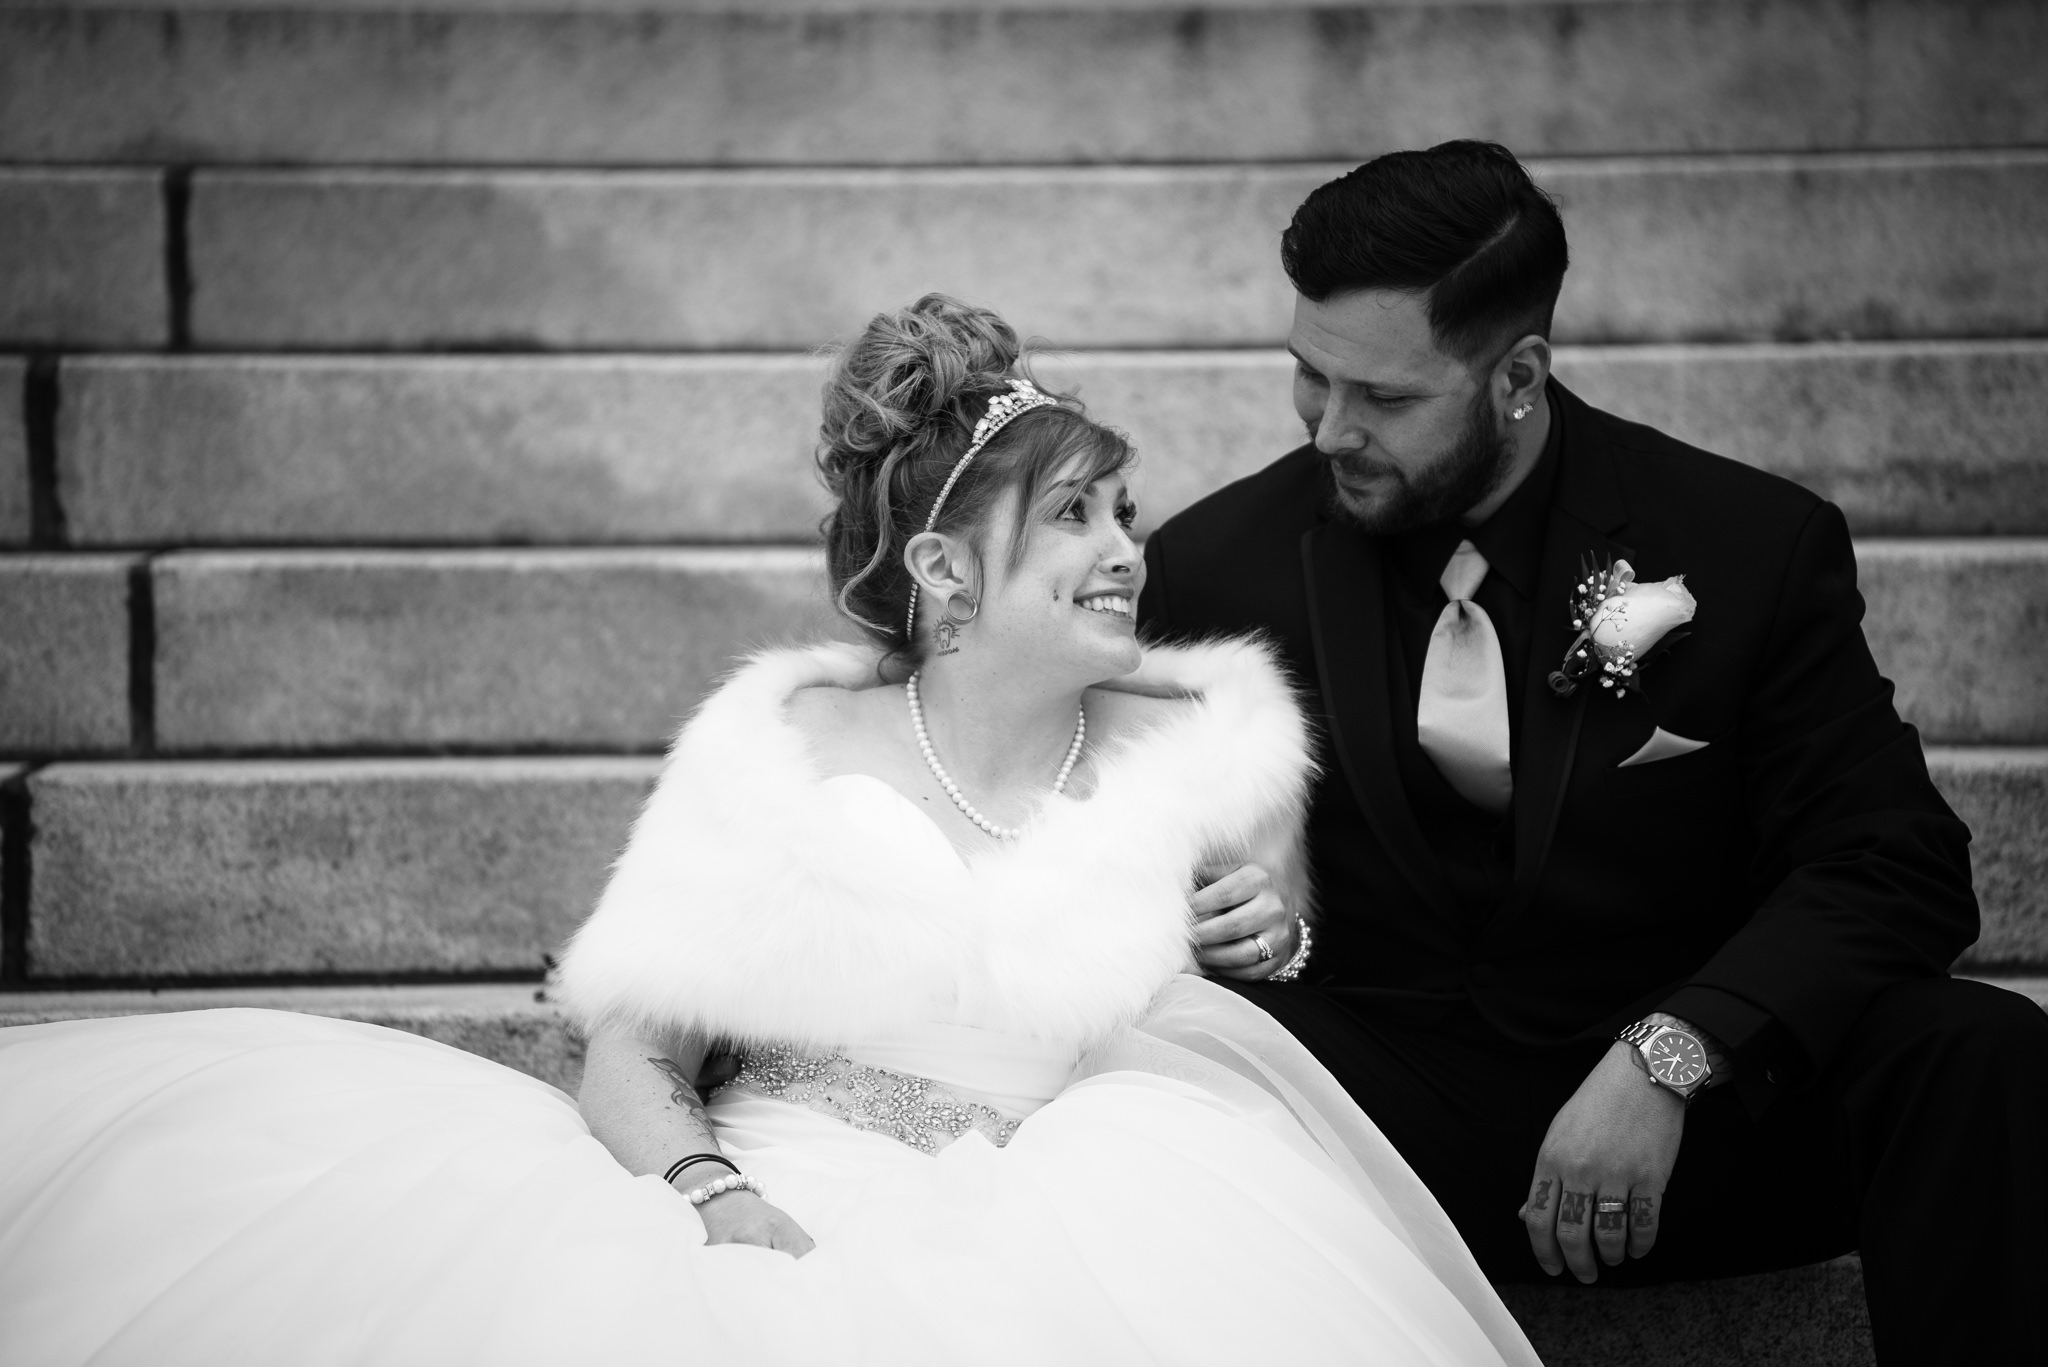 Grant Beachy Photo portrait wedding goshen elkhart south bend chicago-032.jpg